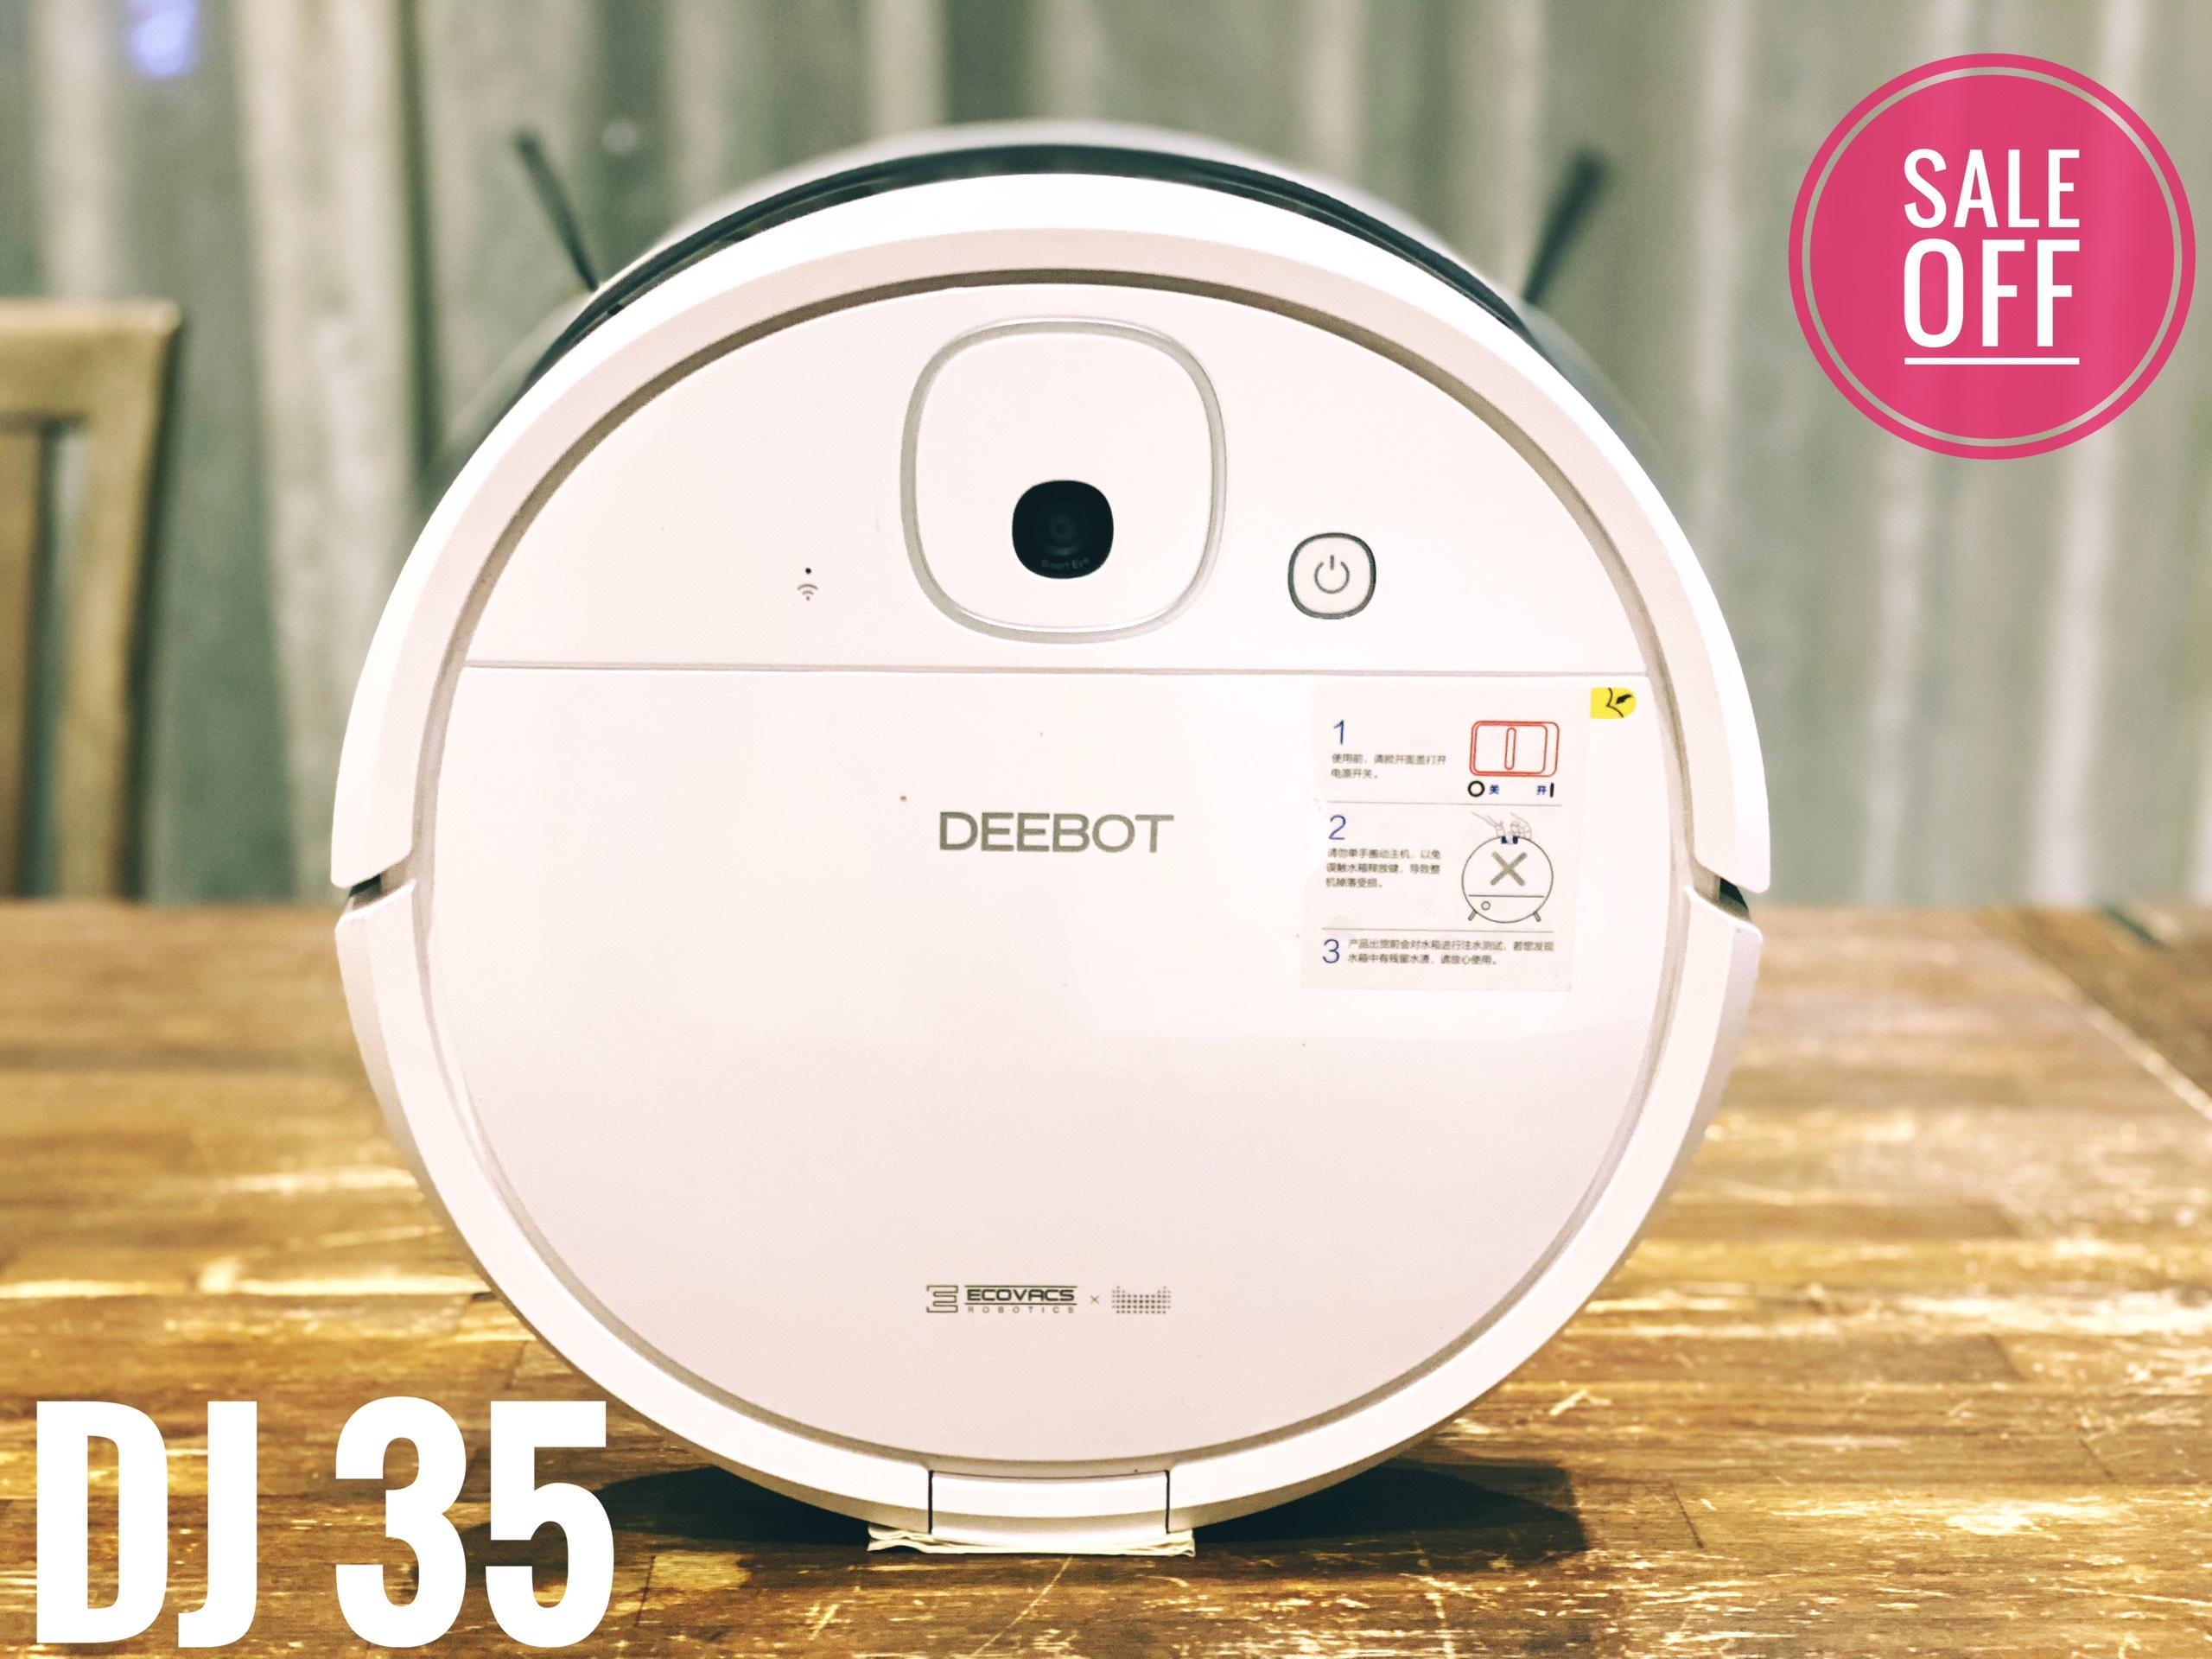 DEEBOT DJ35 2019